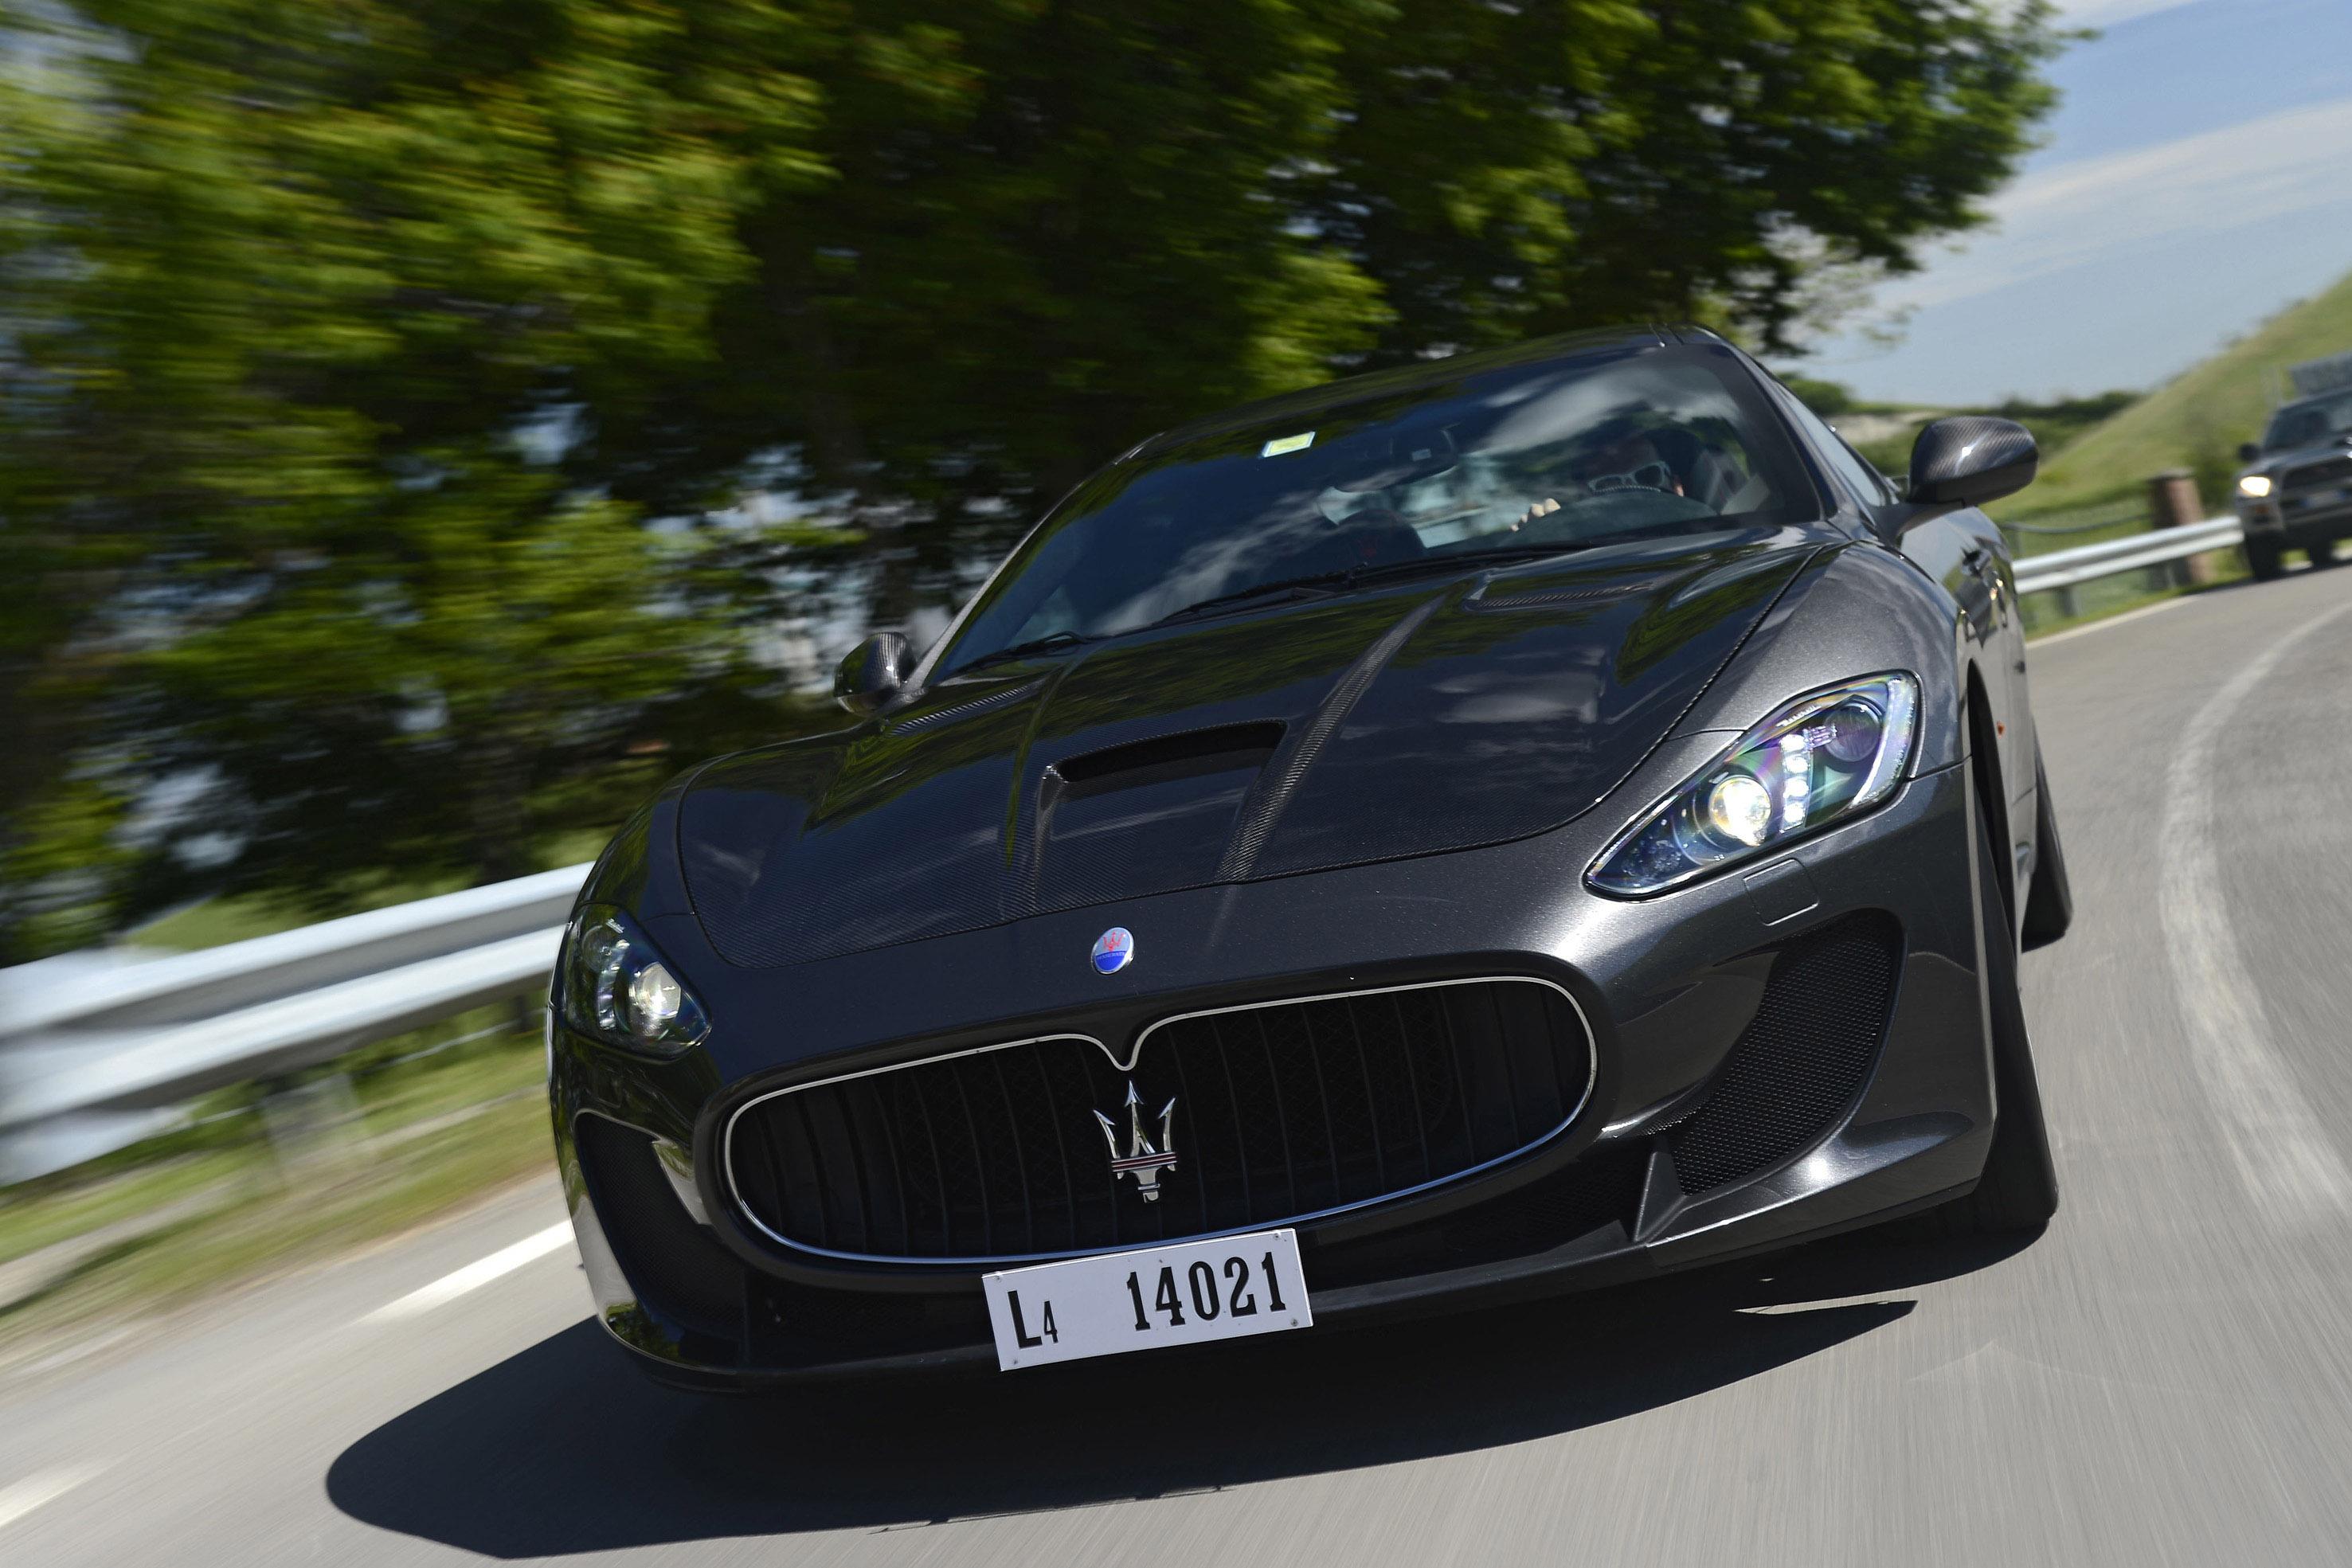 2014 Maserati GranTurismo MC Stradale - HD Pictures ...